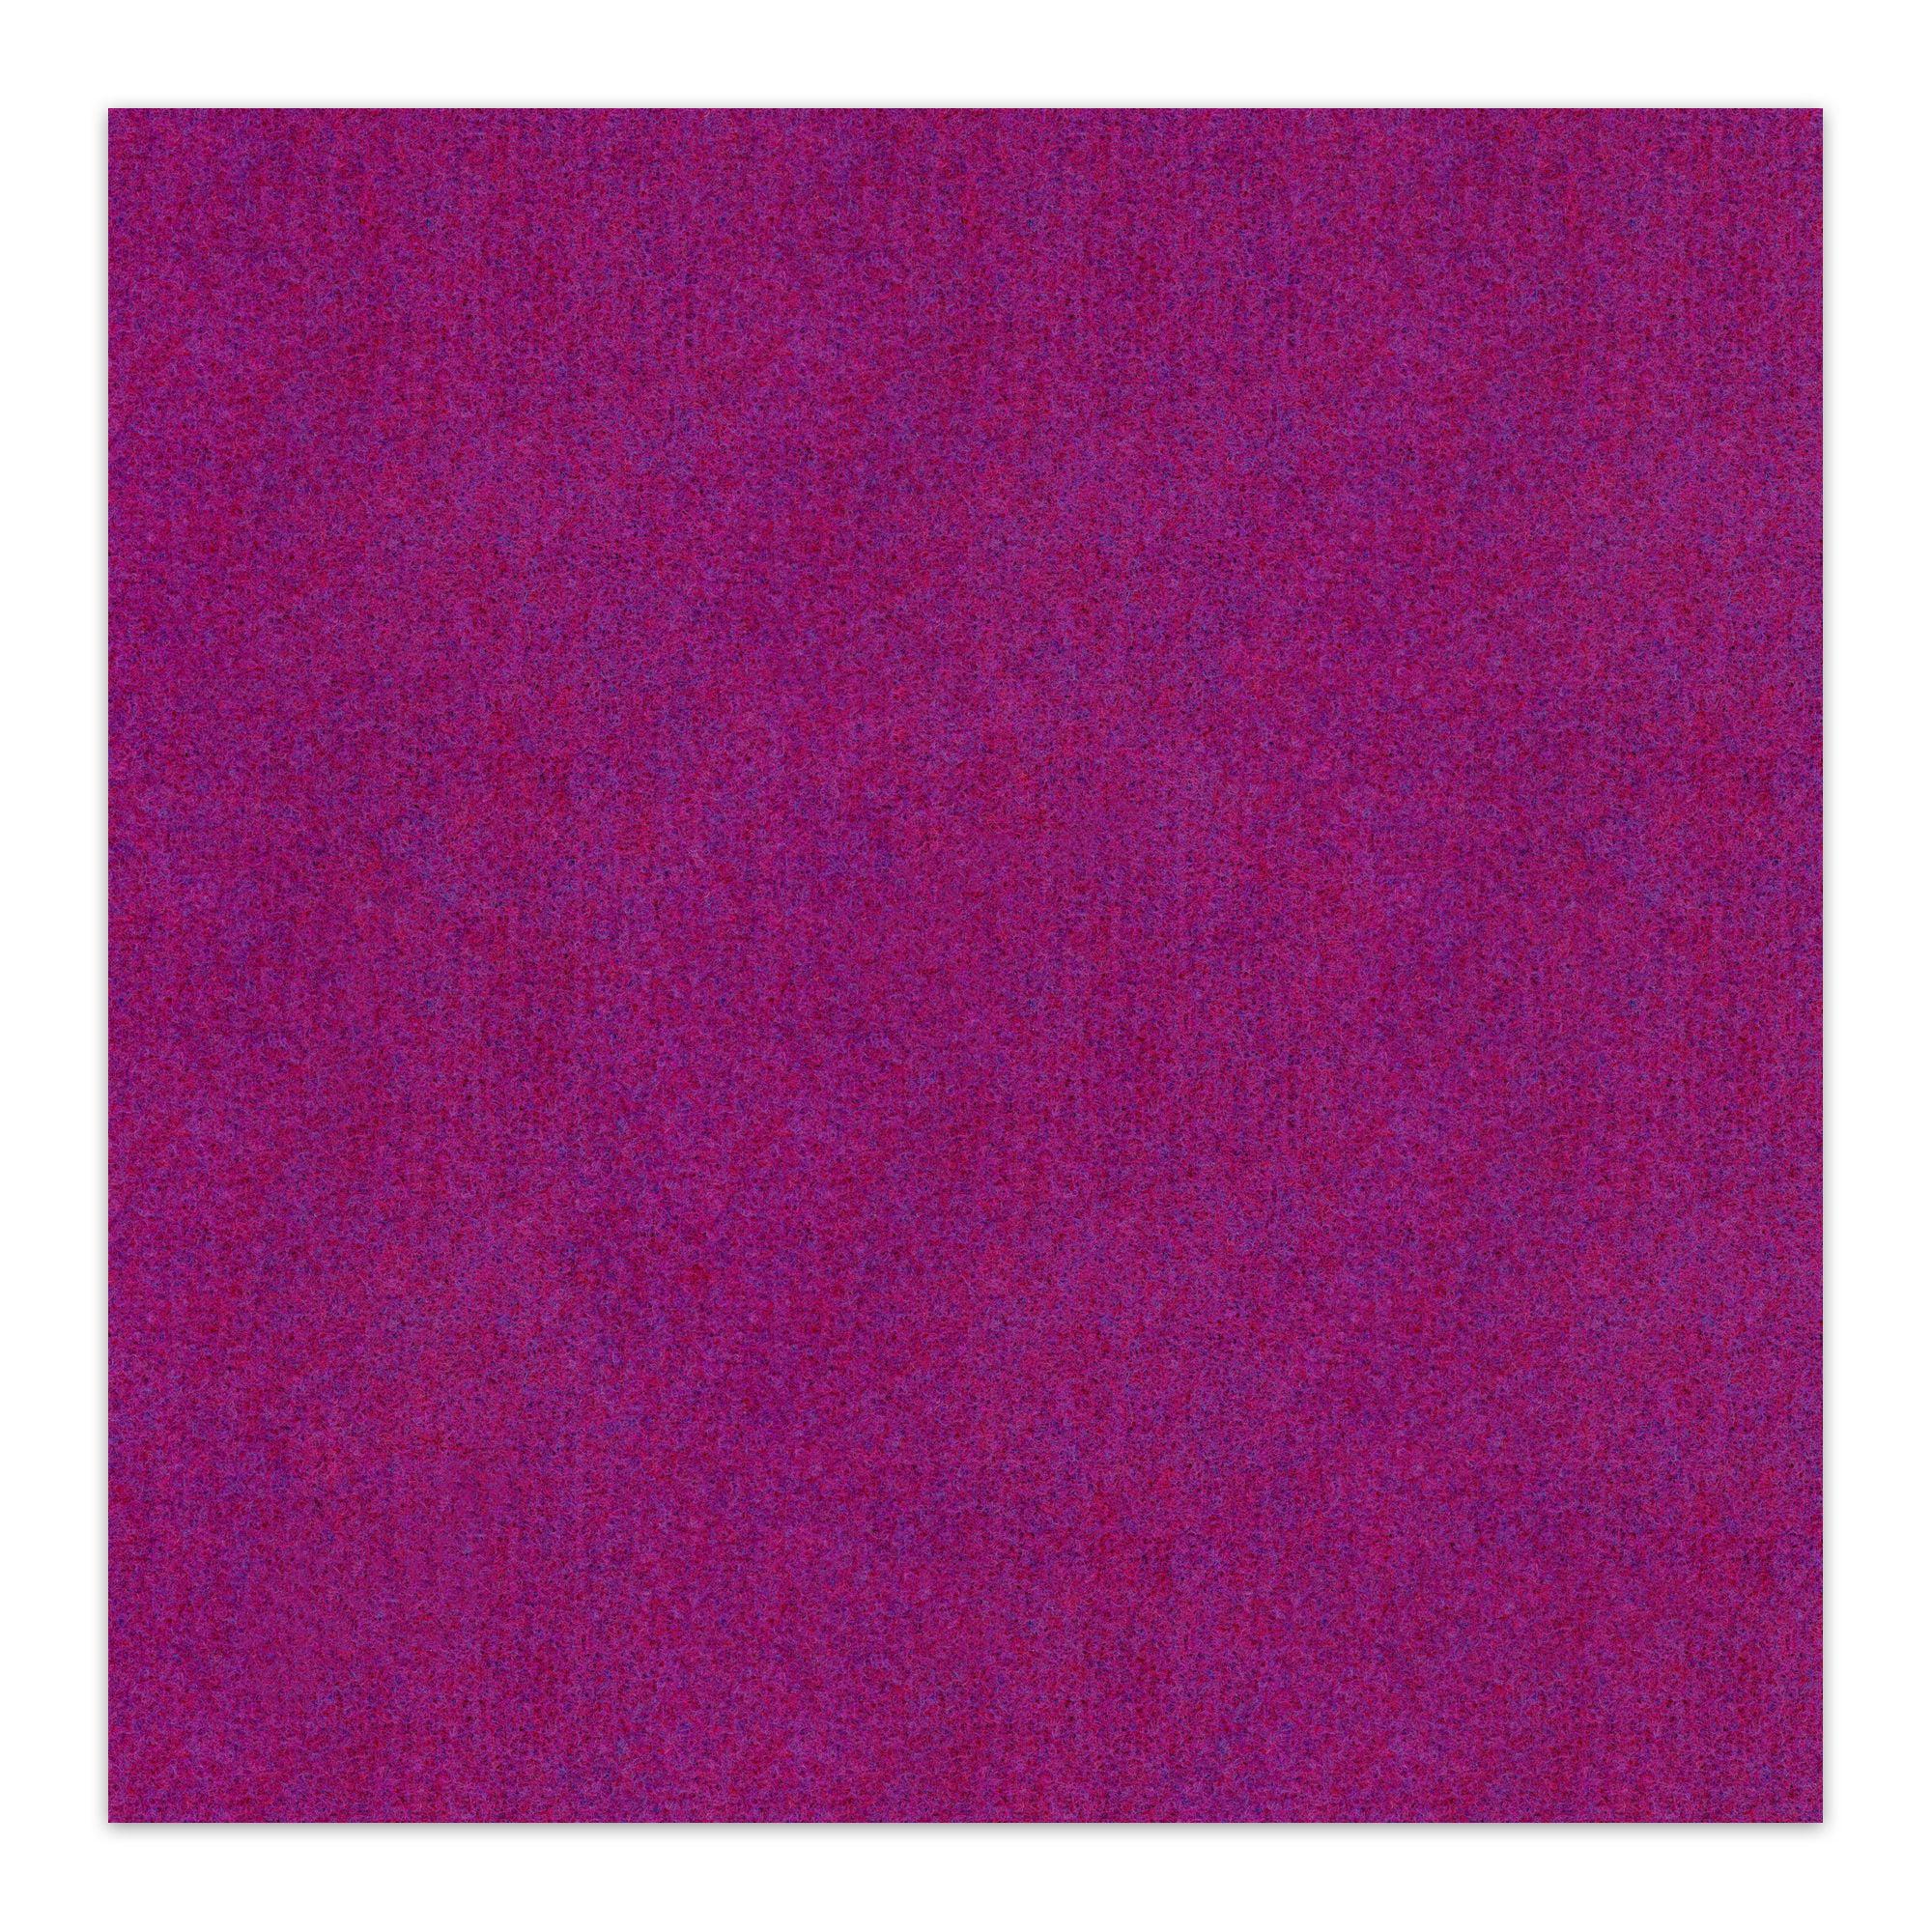 "9"" x 12"" Purple Prickly Felt, 1 Each"